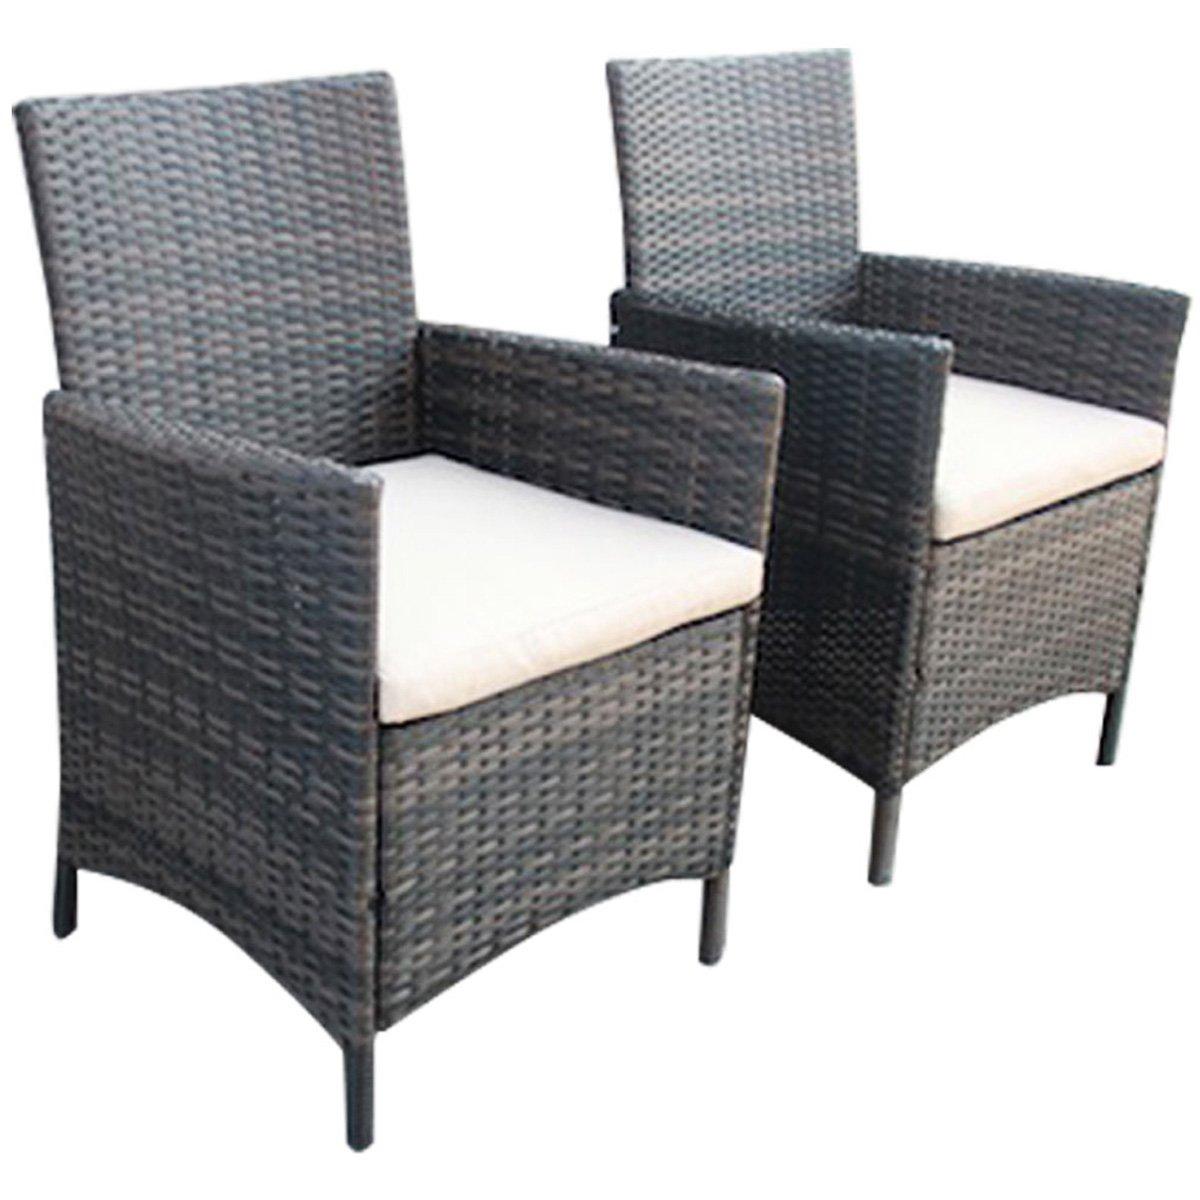 Verona Pair Of Rattan Dining Chairs Garden Furniture Brown